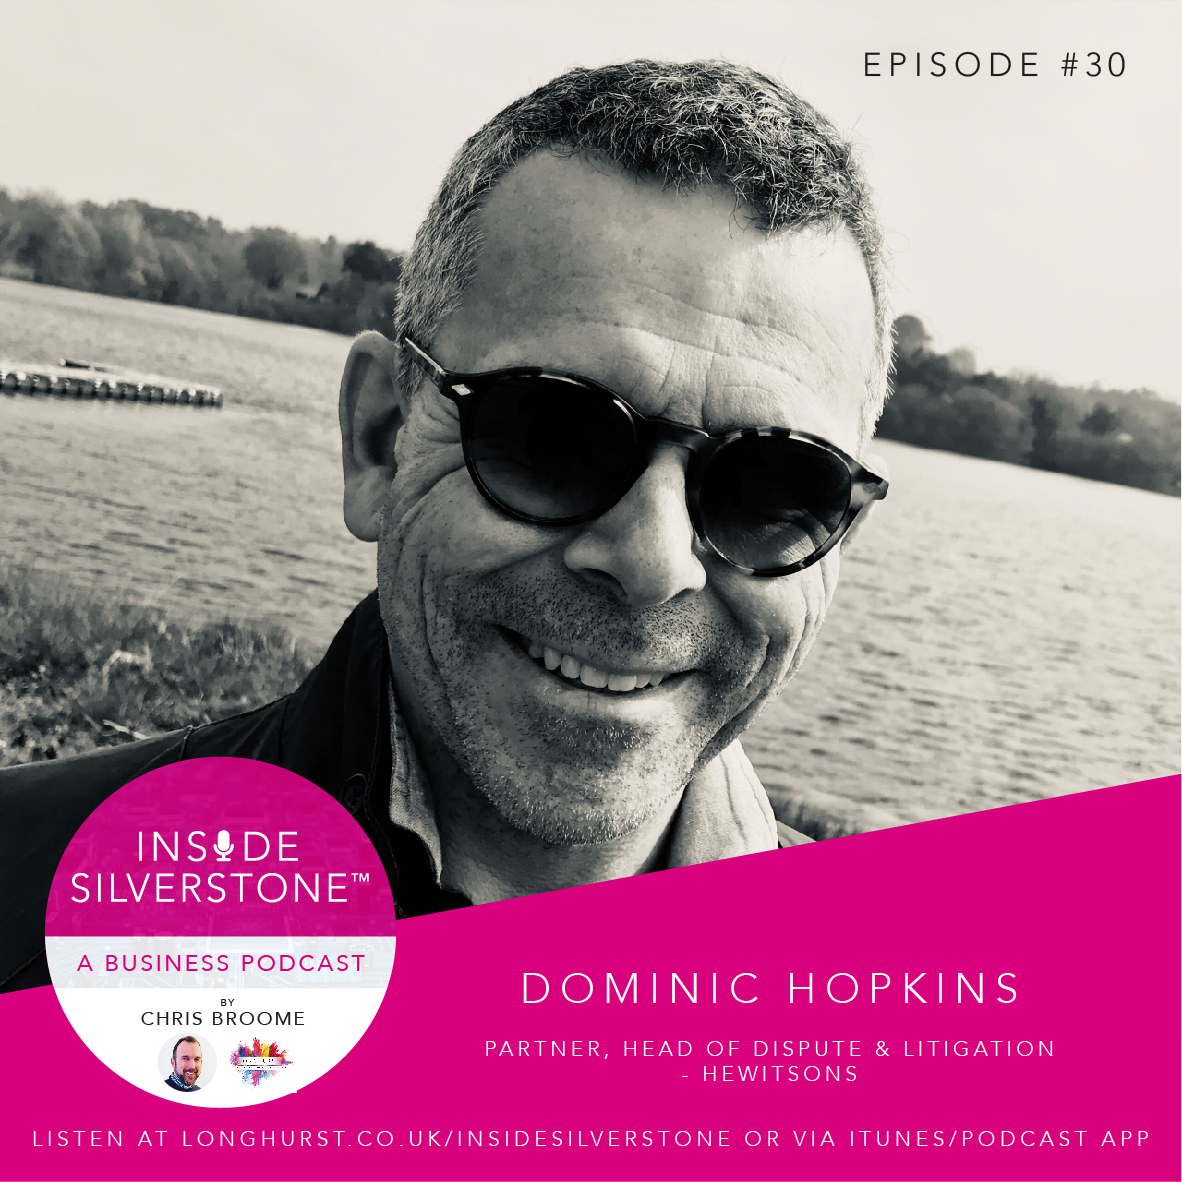 Dominic Hopkins - Partner, Head of Dispute & Litigation - Hewitsons